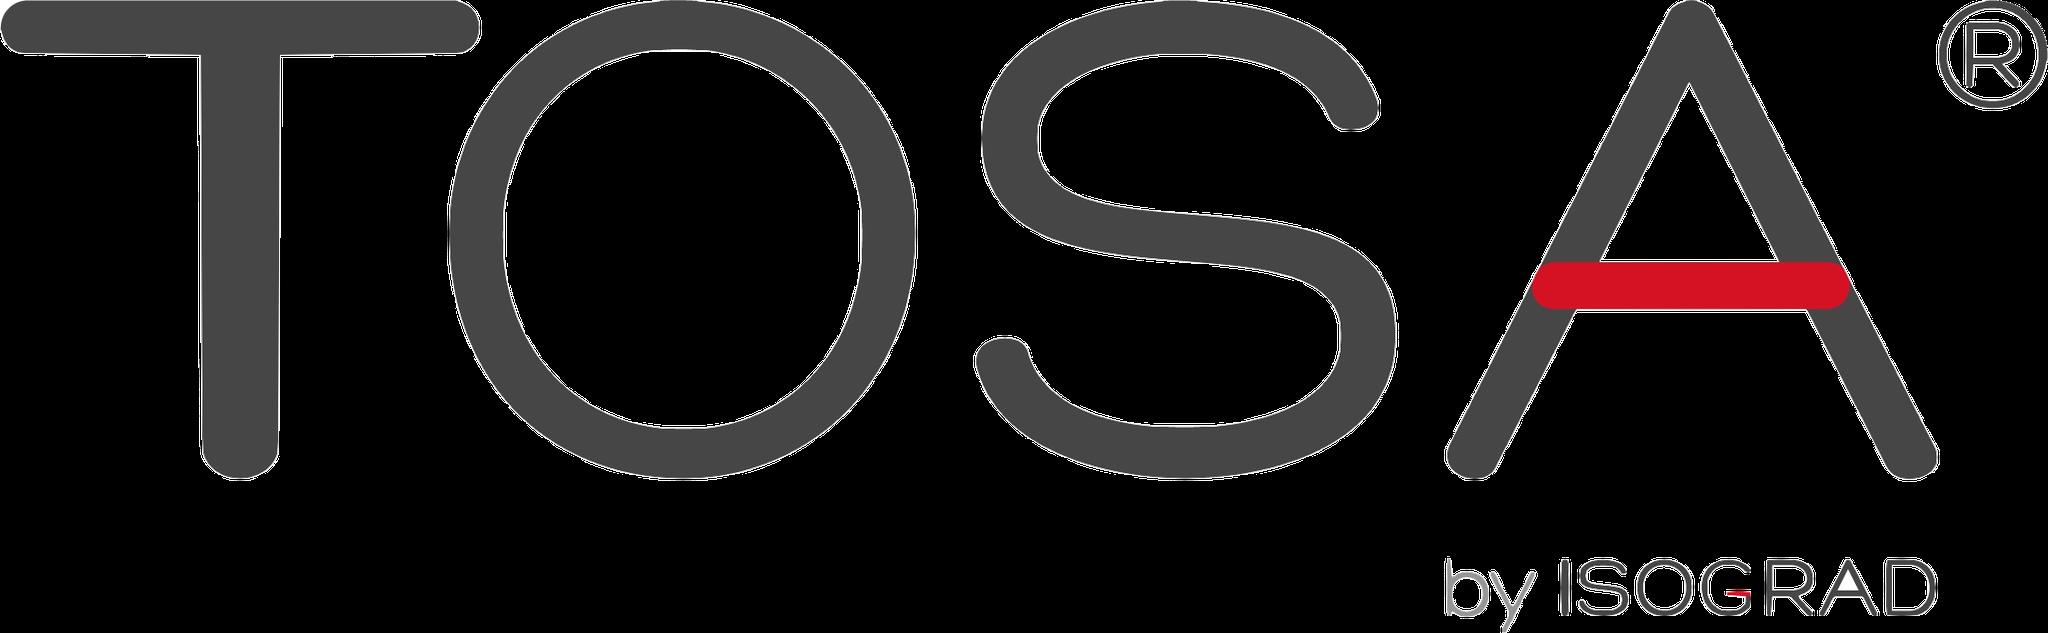 TOSA DESKTOP  -  TOSA Digital